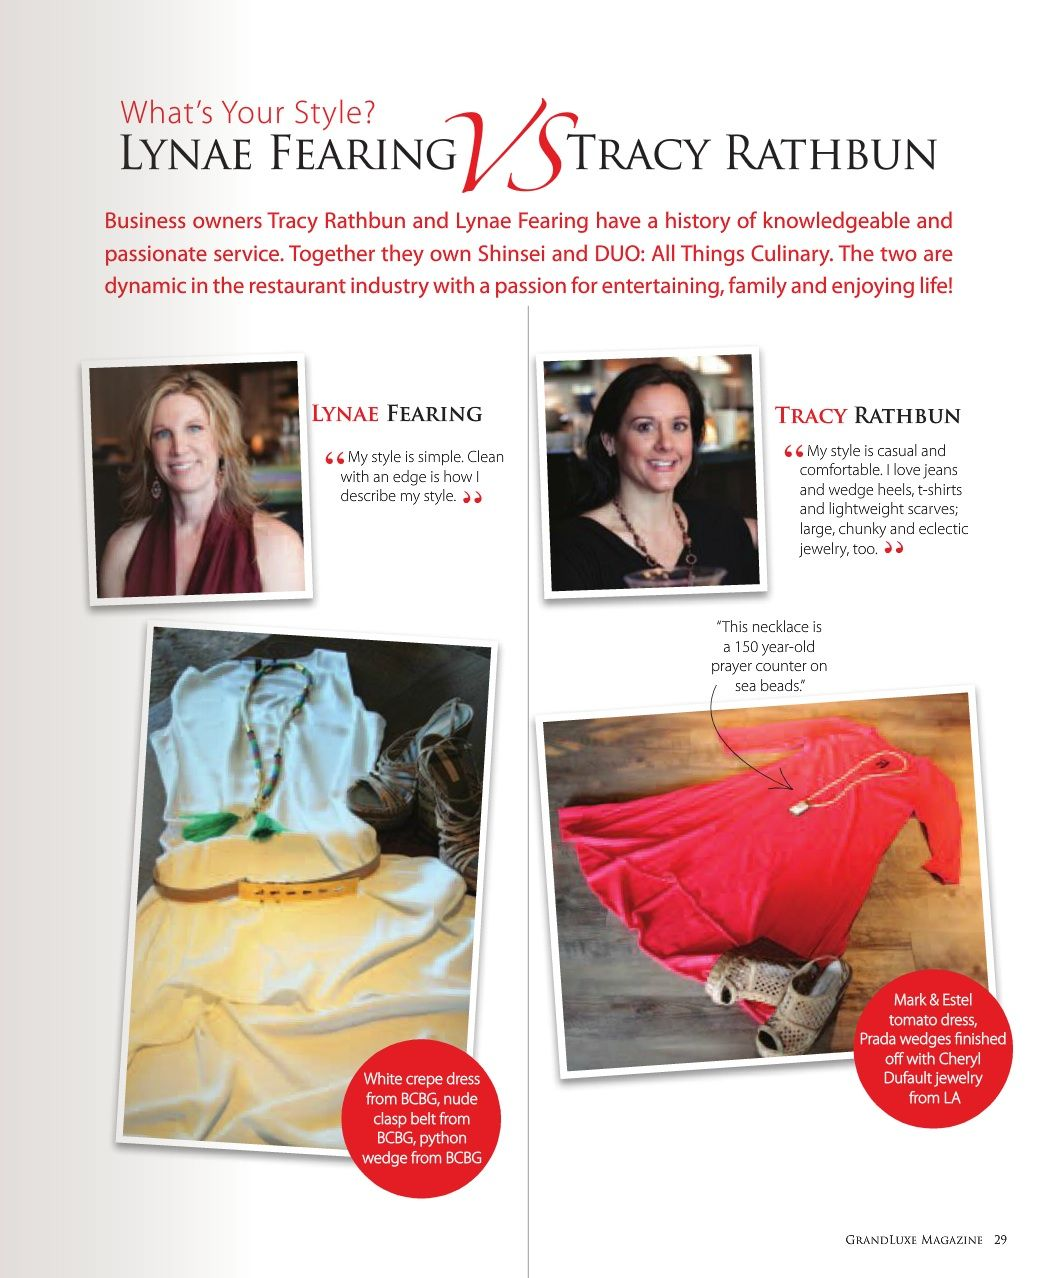 Lynae Fearing vs. Tracy Rathbun